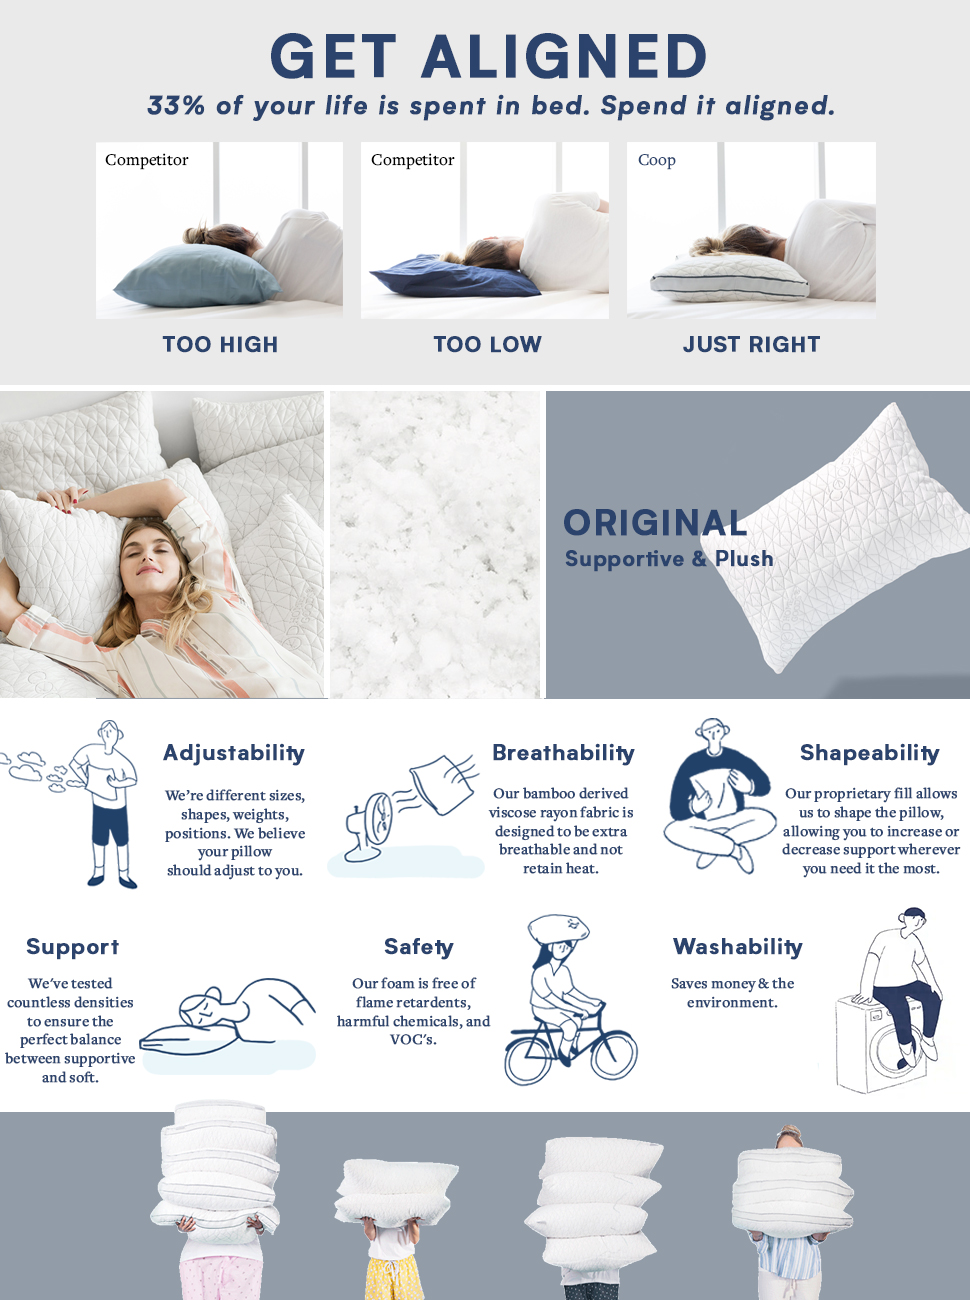 coop home goods premium adjustable loft shredded memory foam pillow with certipurus certified foam